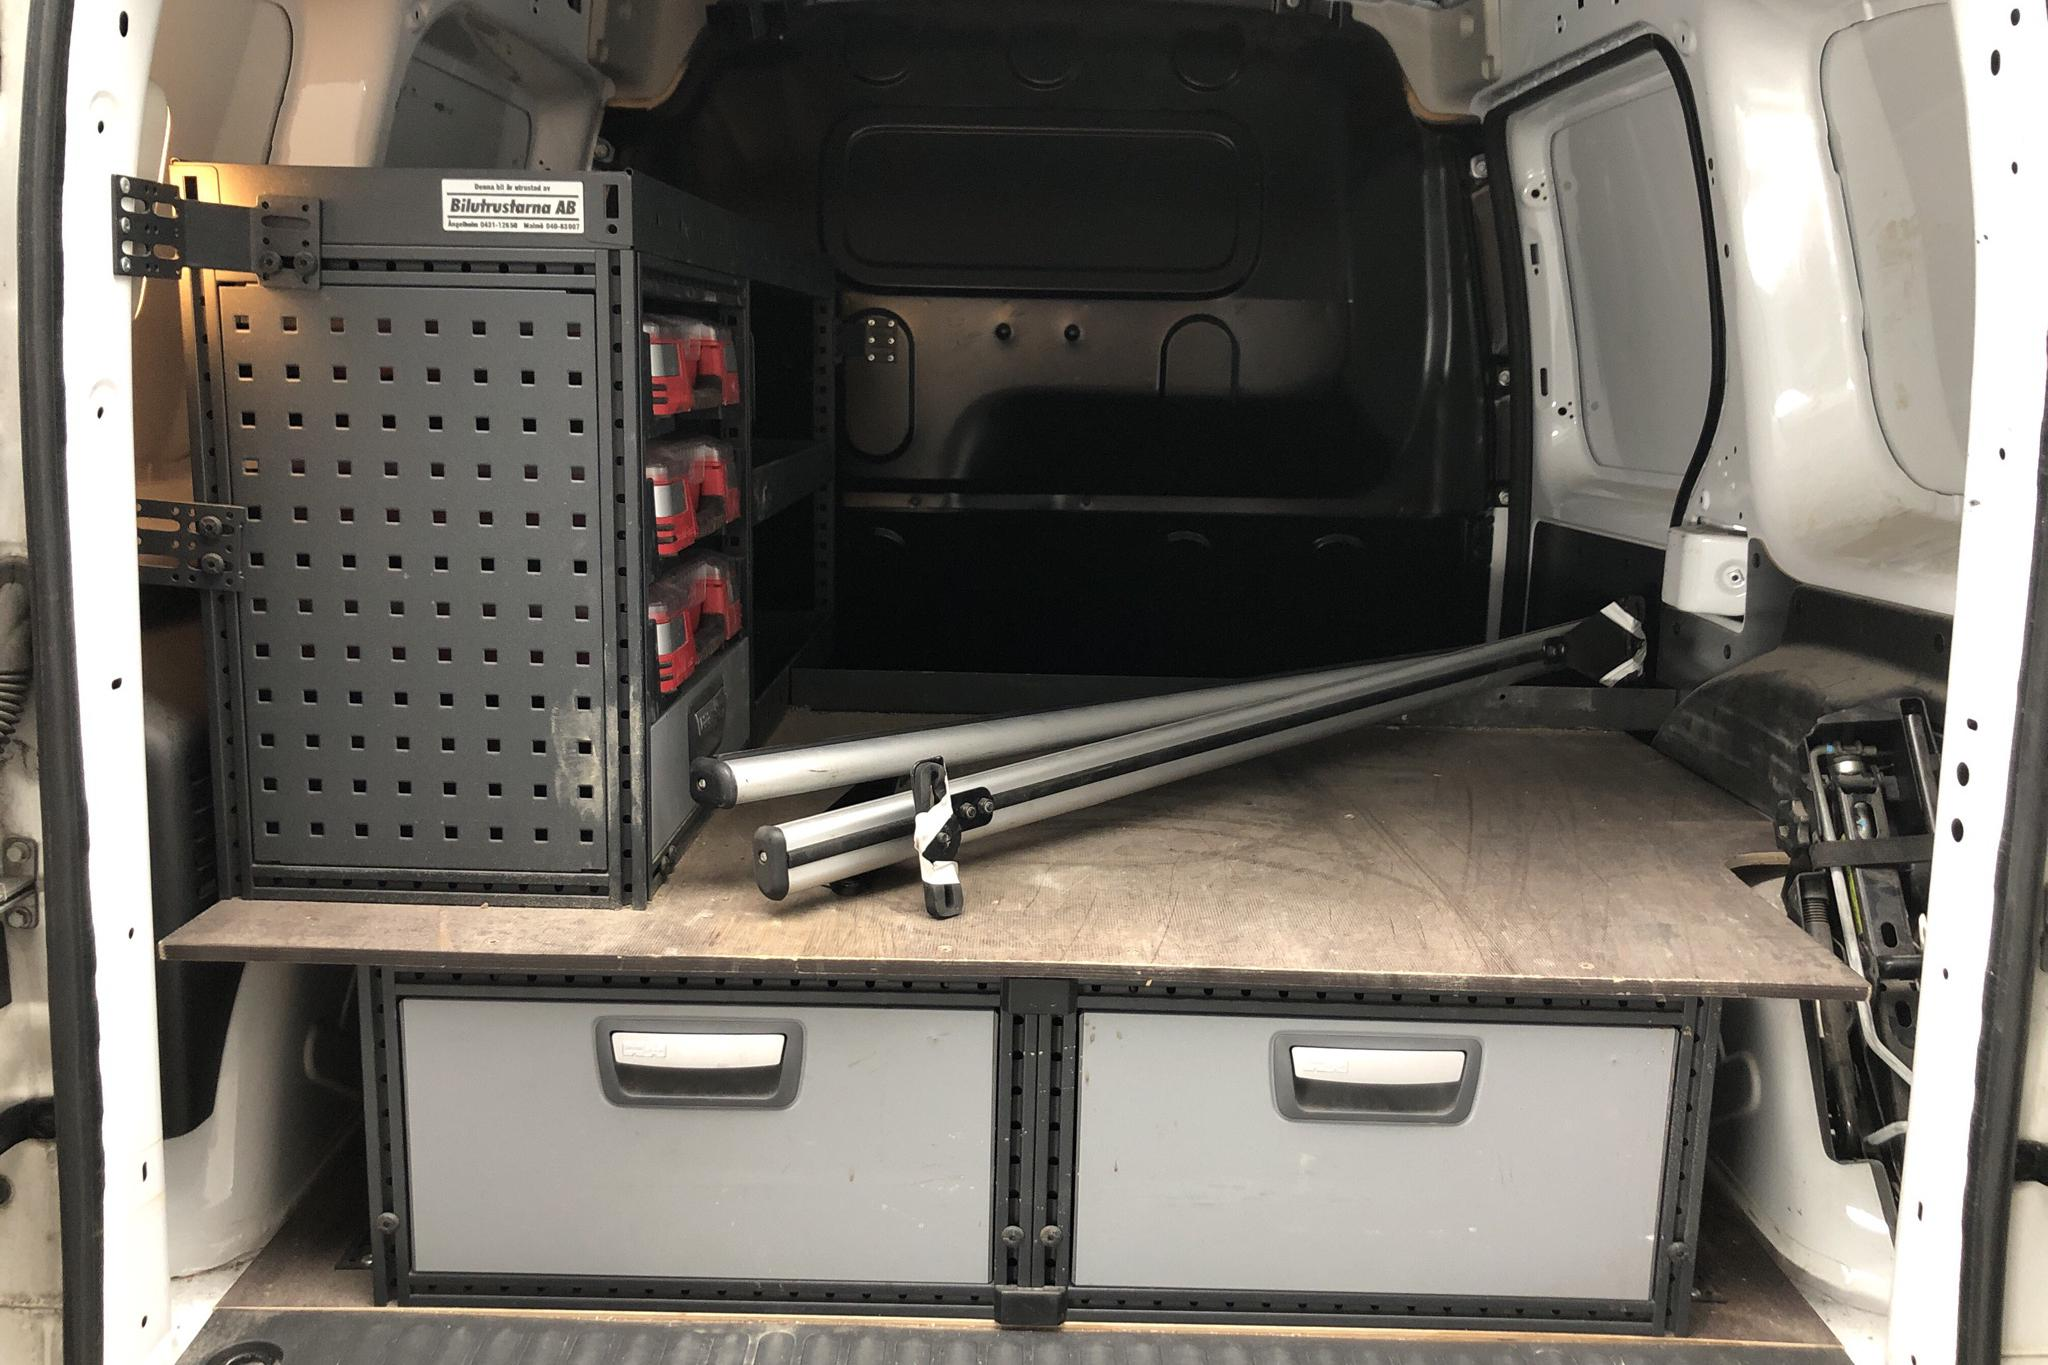 Mercedes Citan 109 1.5 CDI (90hk) - 17 709 mil - Manuell - vit - 2017